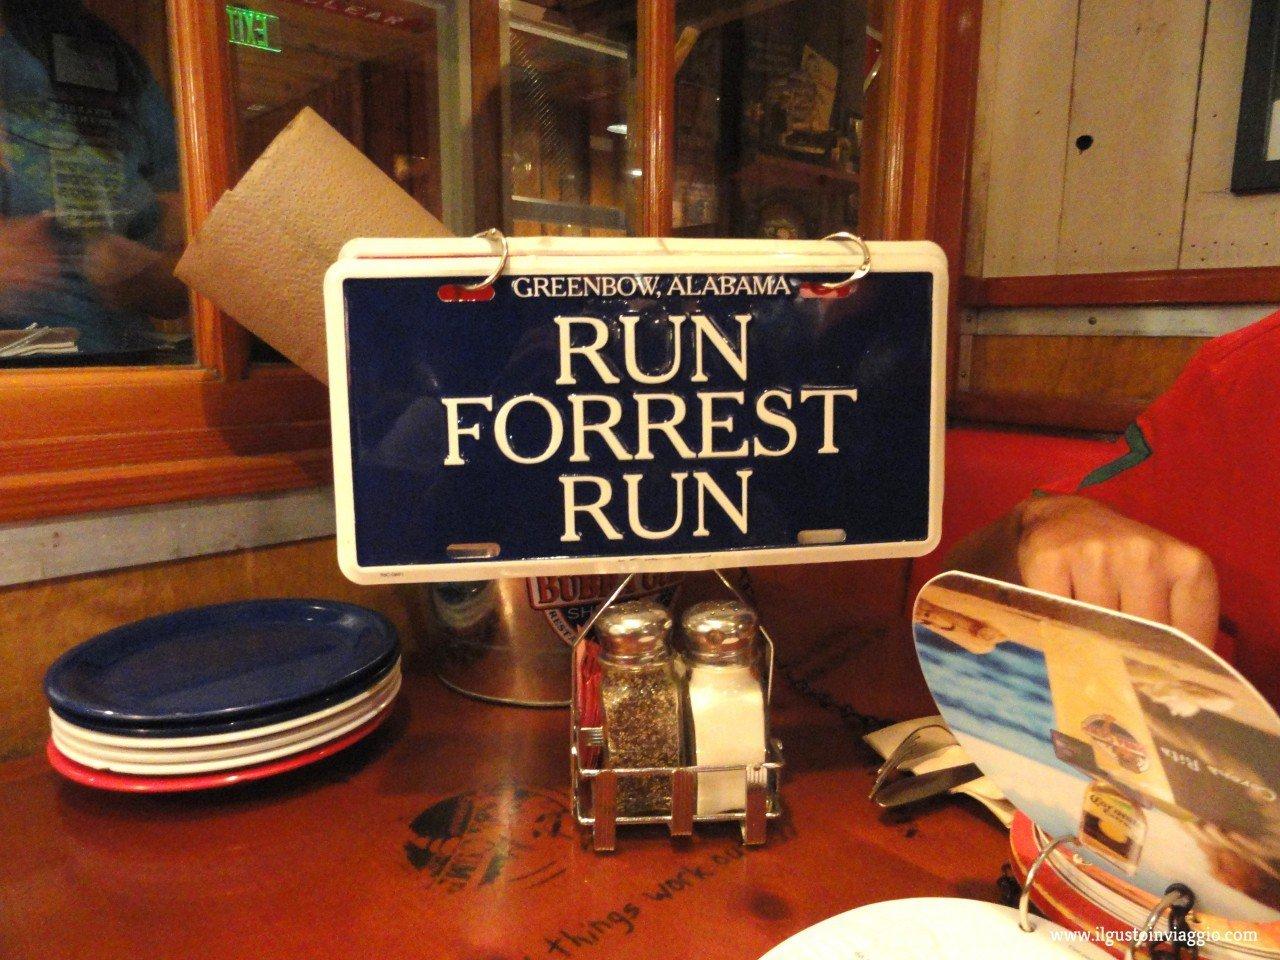 run forrest run, mangiare da bubba gump santa monica pier